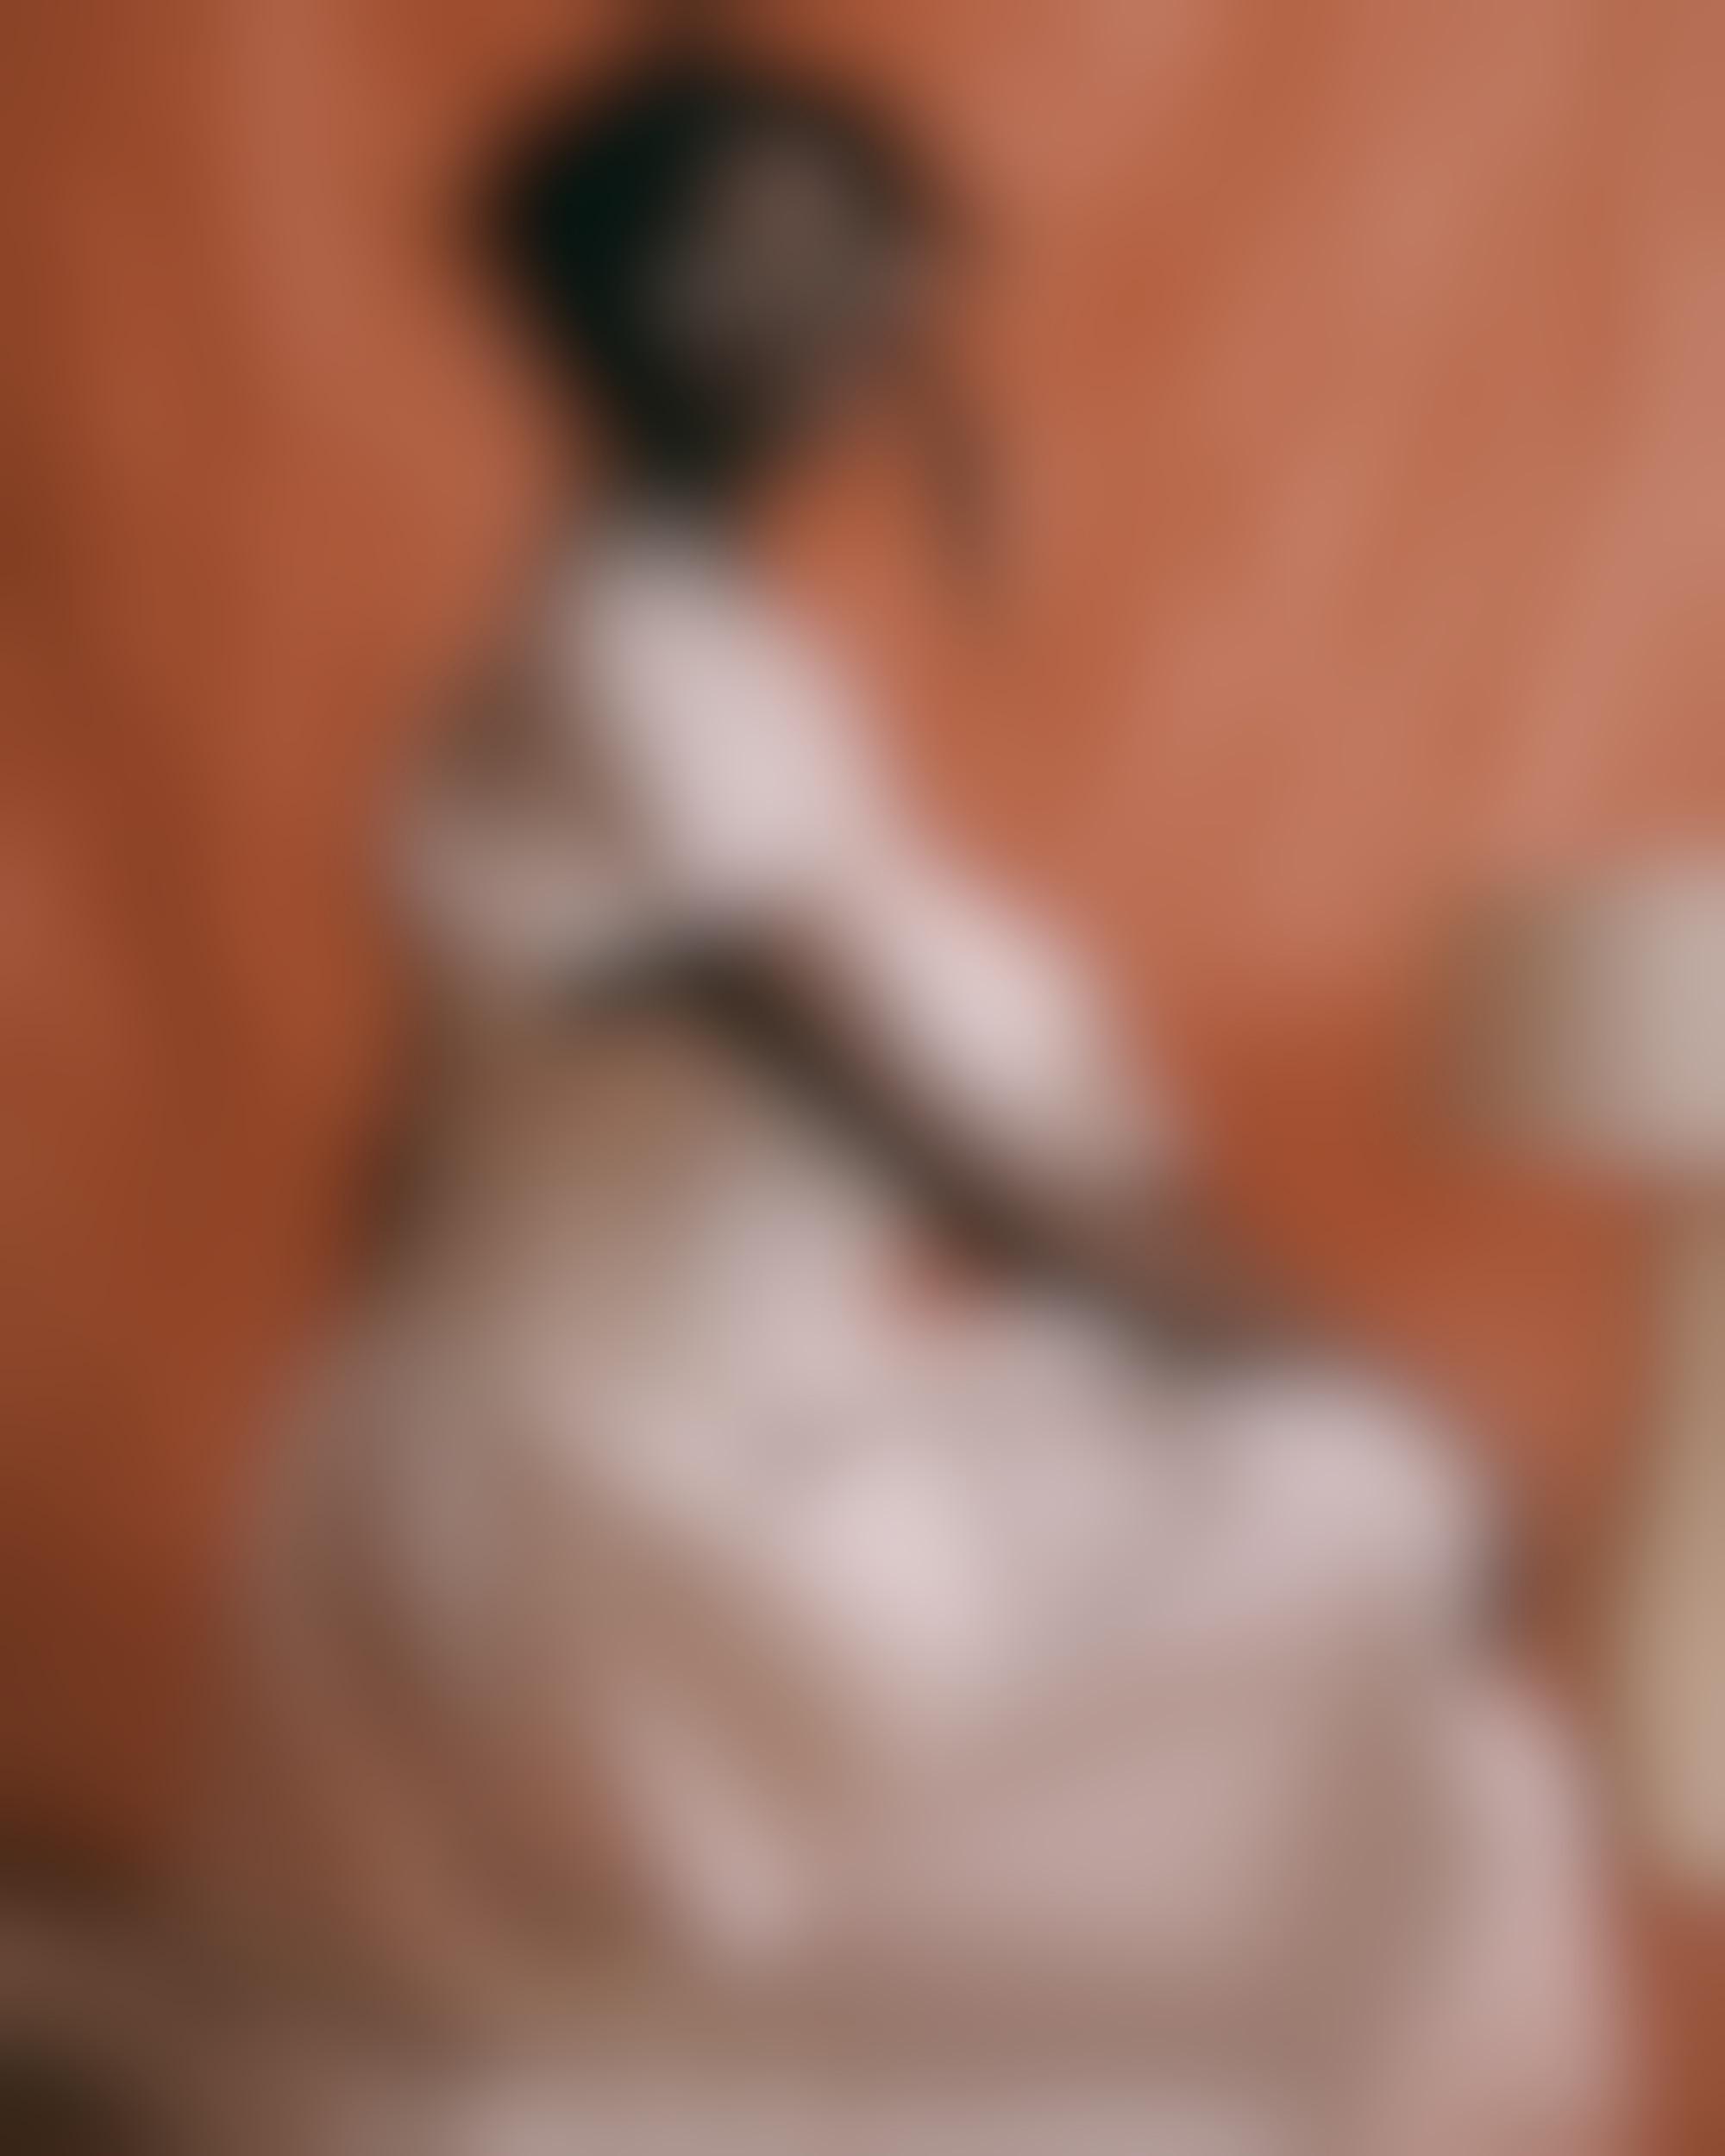 Christina nwabugo photography lectureinprogress 02 autocompressfitresizeixlibphp 1 1 0max h2000max w3 D2000q80s7e10ce93ac2a2ecf2d1ed00b63b511e0